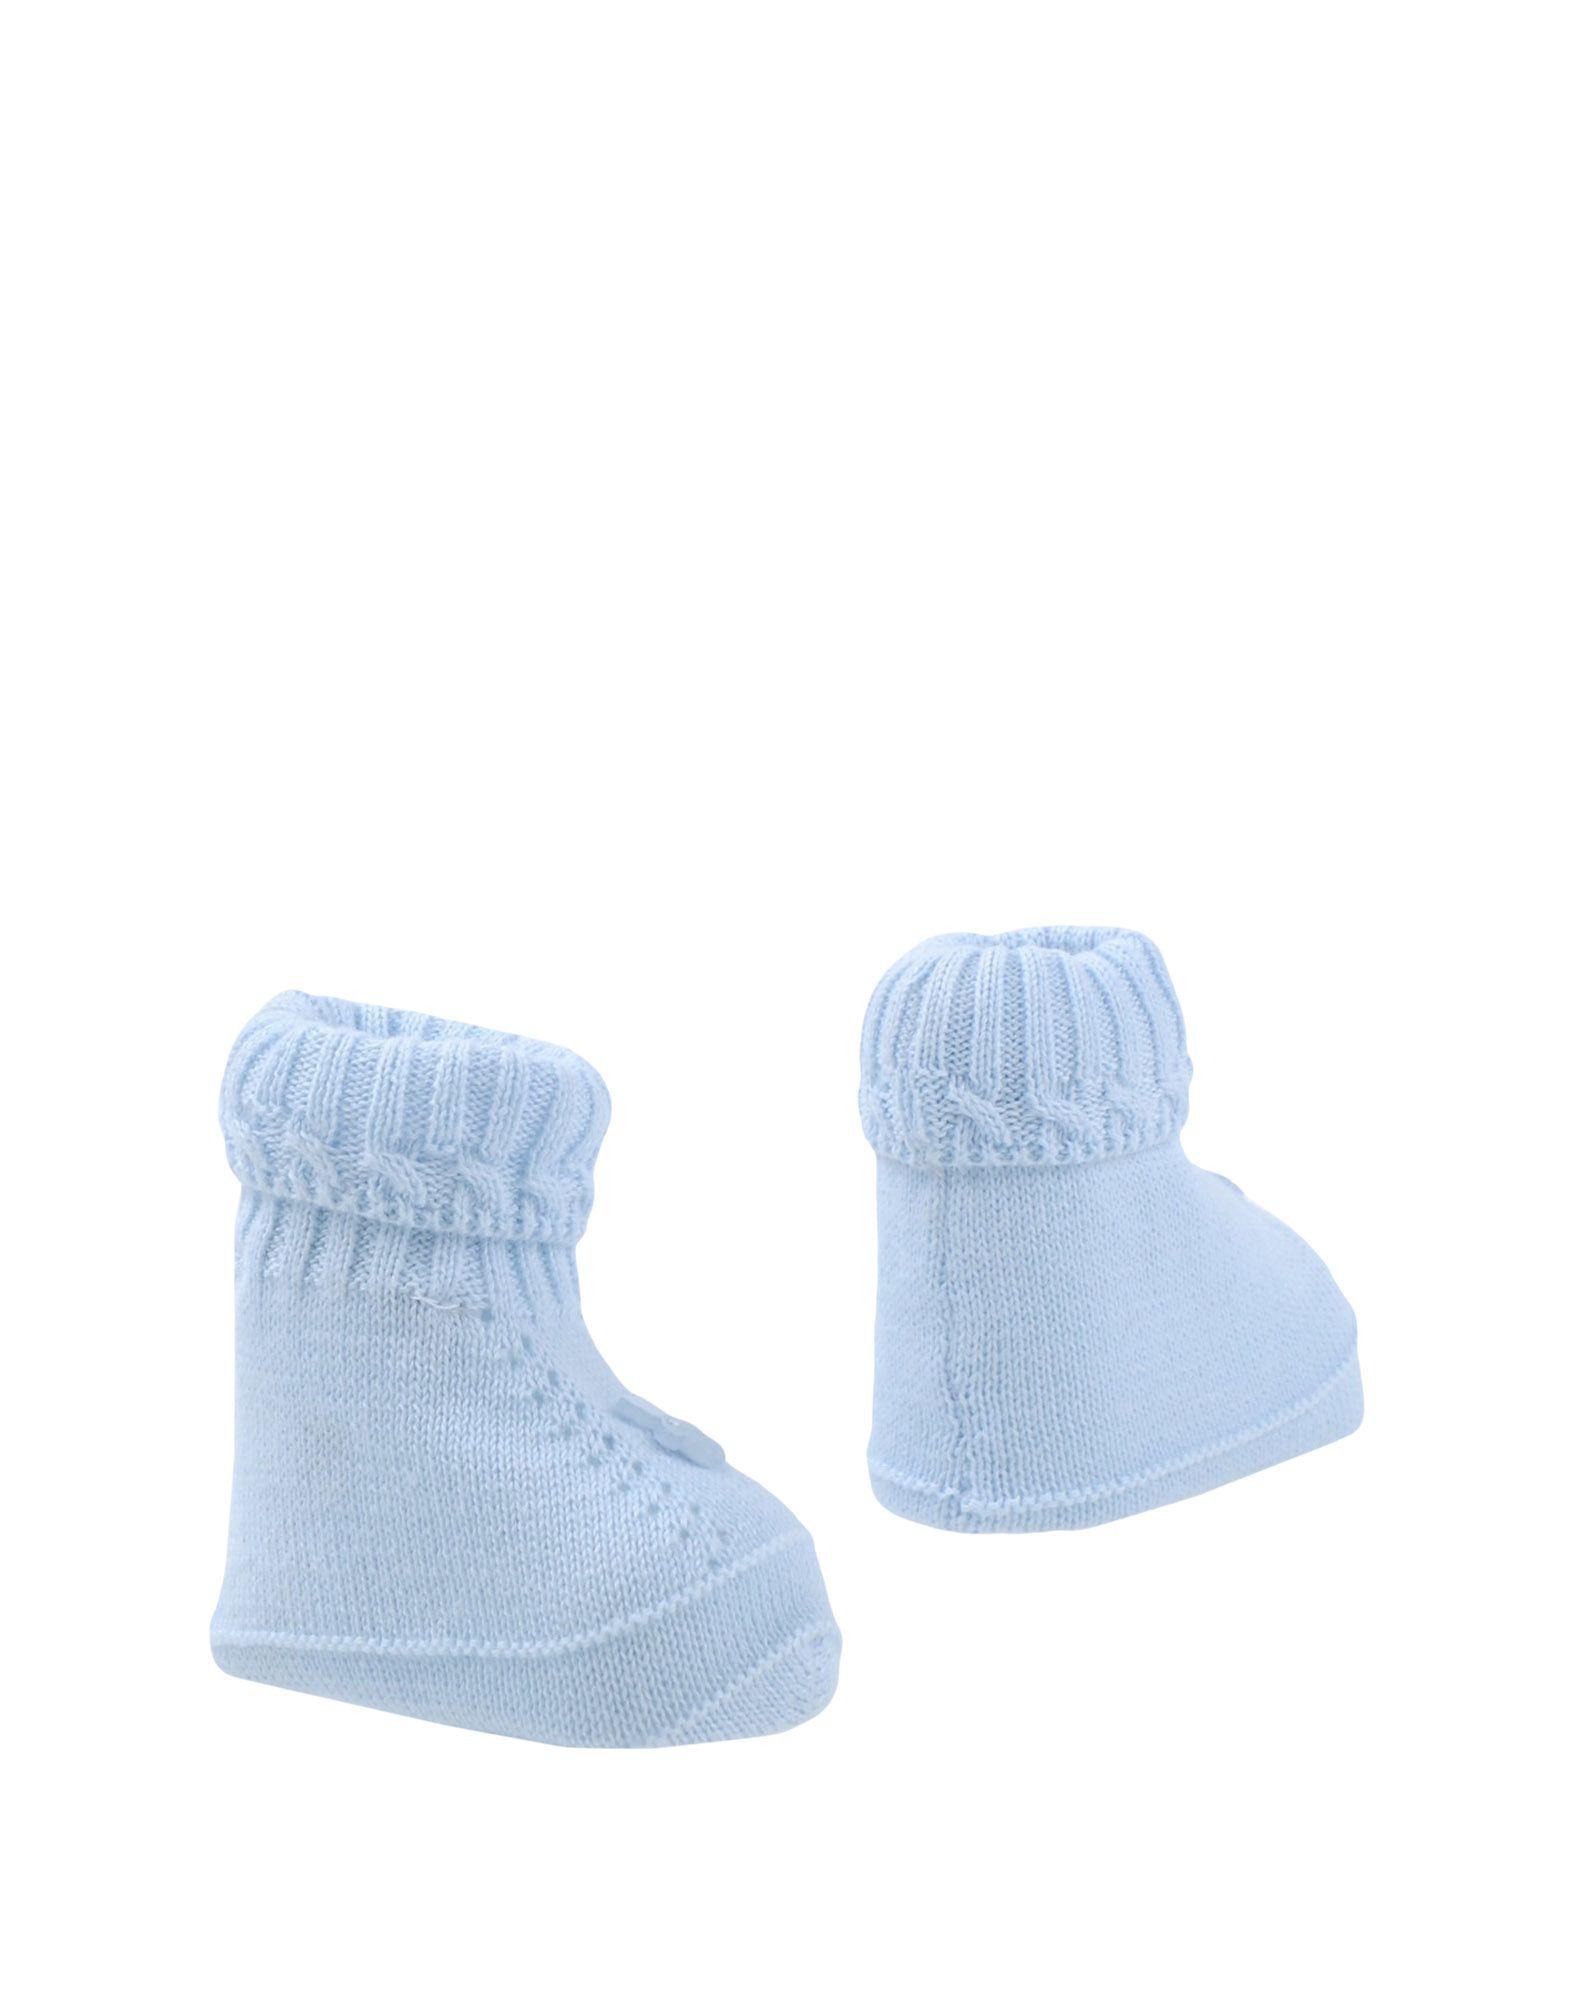 NANÁN Обувь для новорожденных цены онлайн